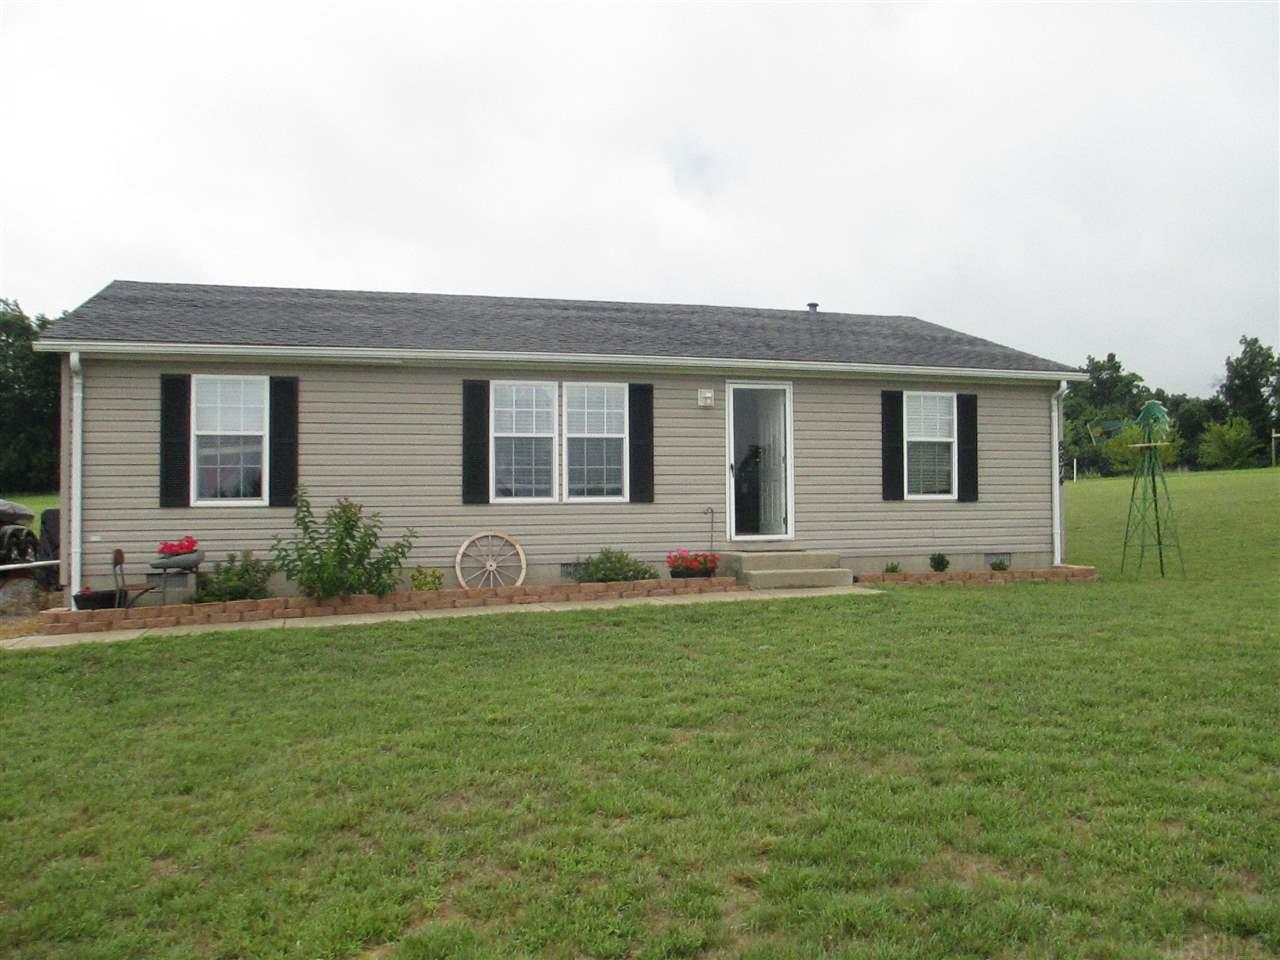 8874 S Meadow, Owensville, IN 47665